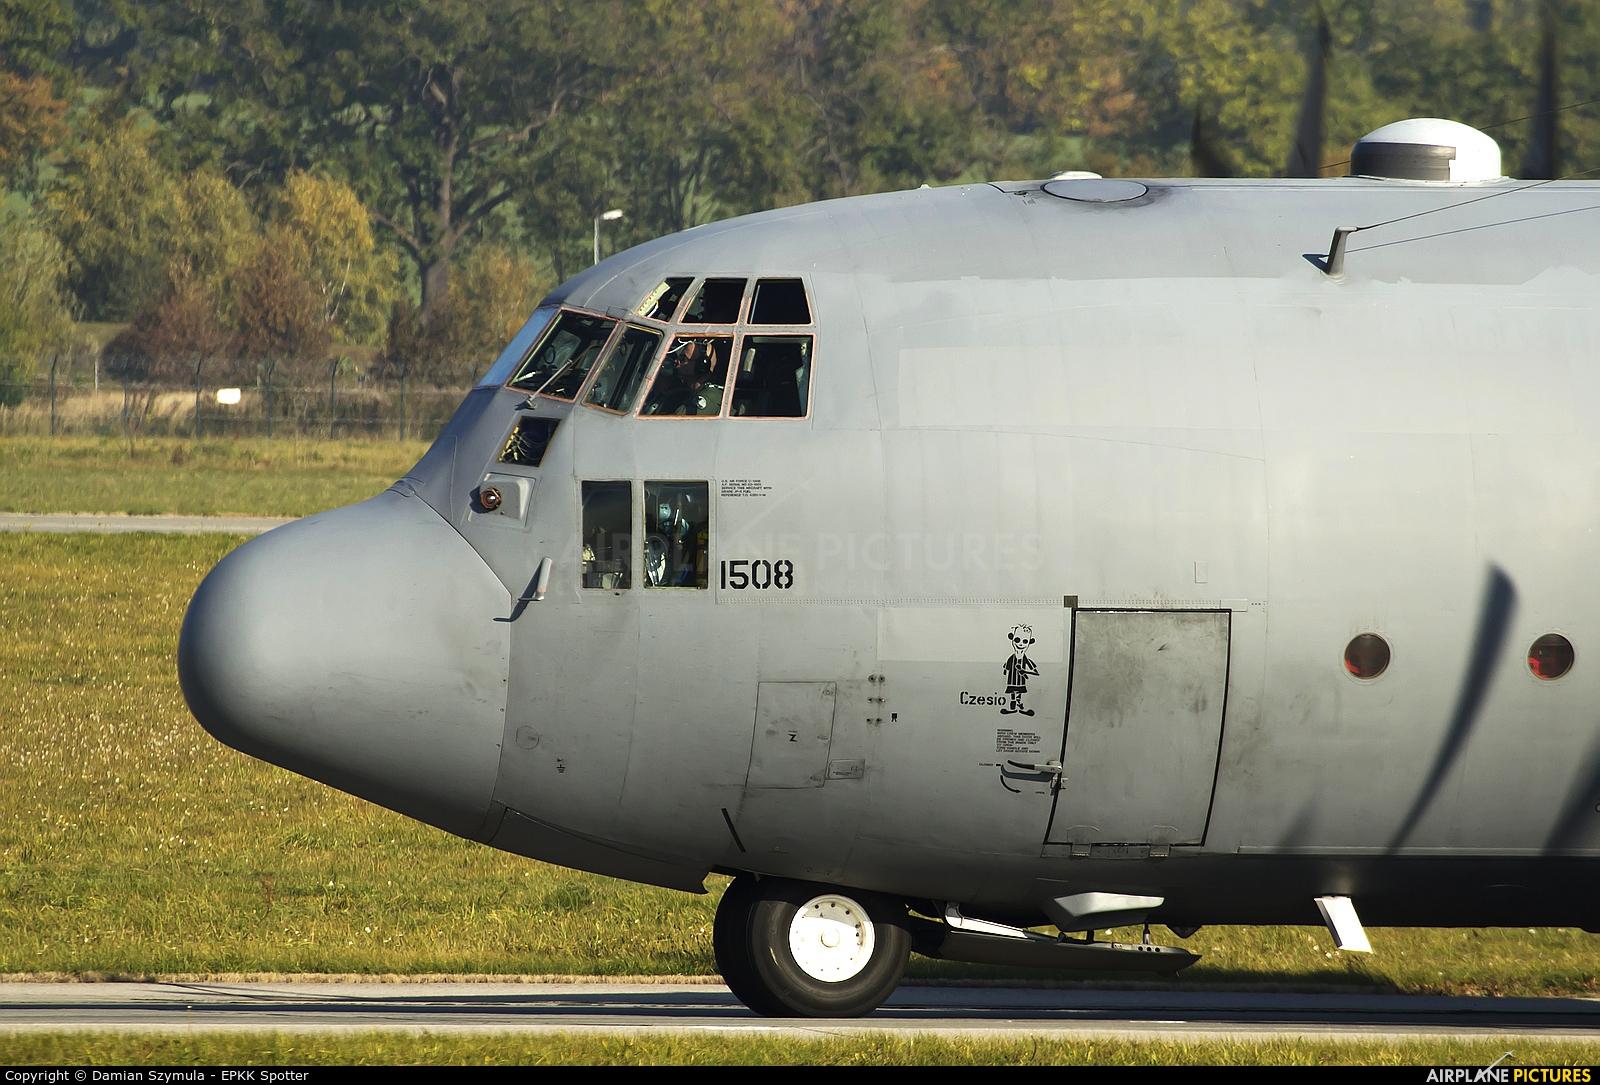 Poland - Air Force 1508 aircraft at Kraków - John Paul II Intl